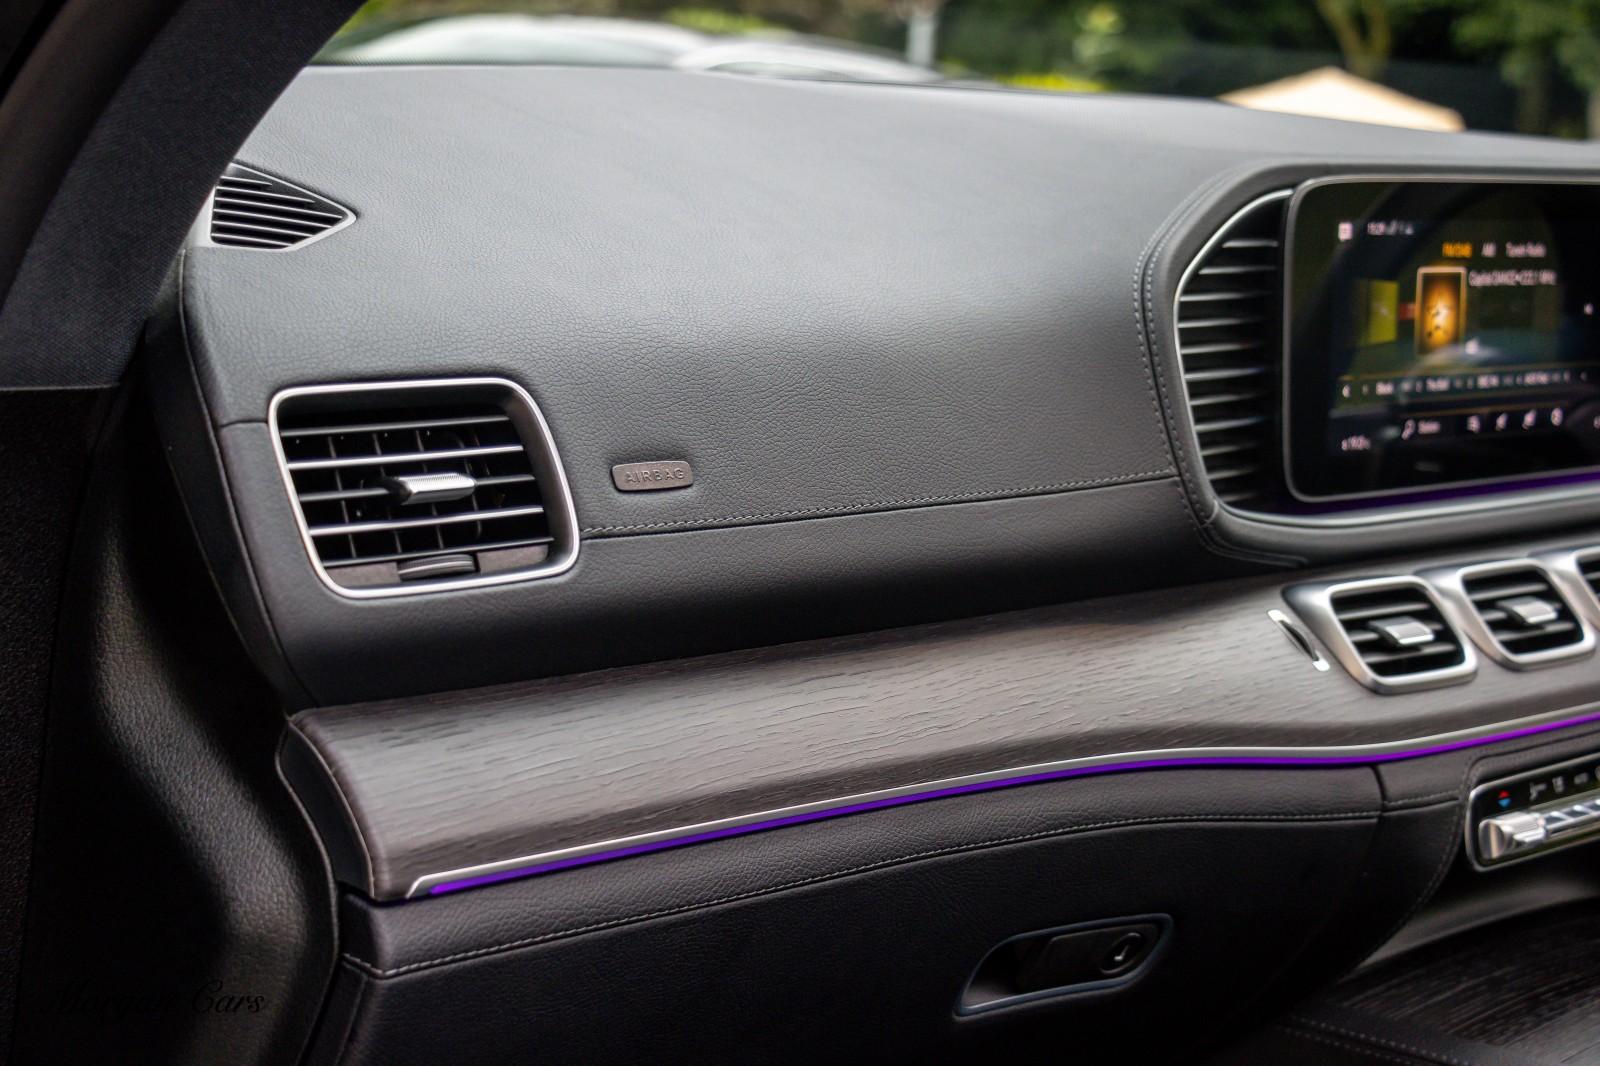 2020 Mercedes-Benz  GLS 400 D 4MATIC AMG LINE PREMIUM PLUS Diesel Automatic – Morgan Cars 9 Mound Road, Warrenpoint, Newry BT34 3LW, UK full